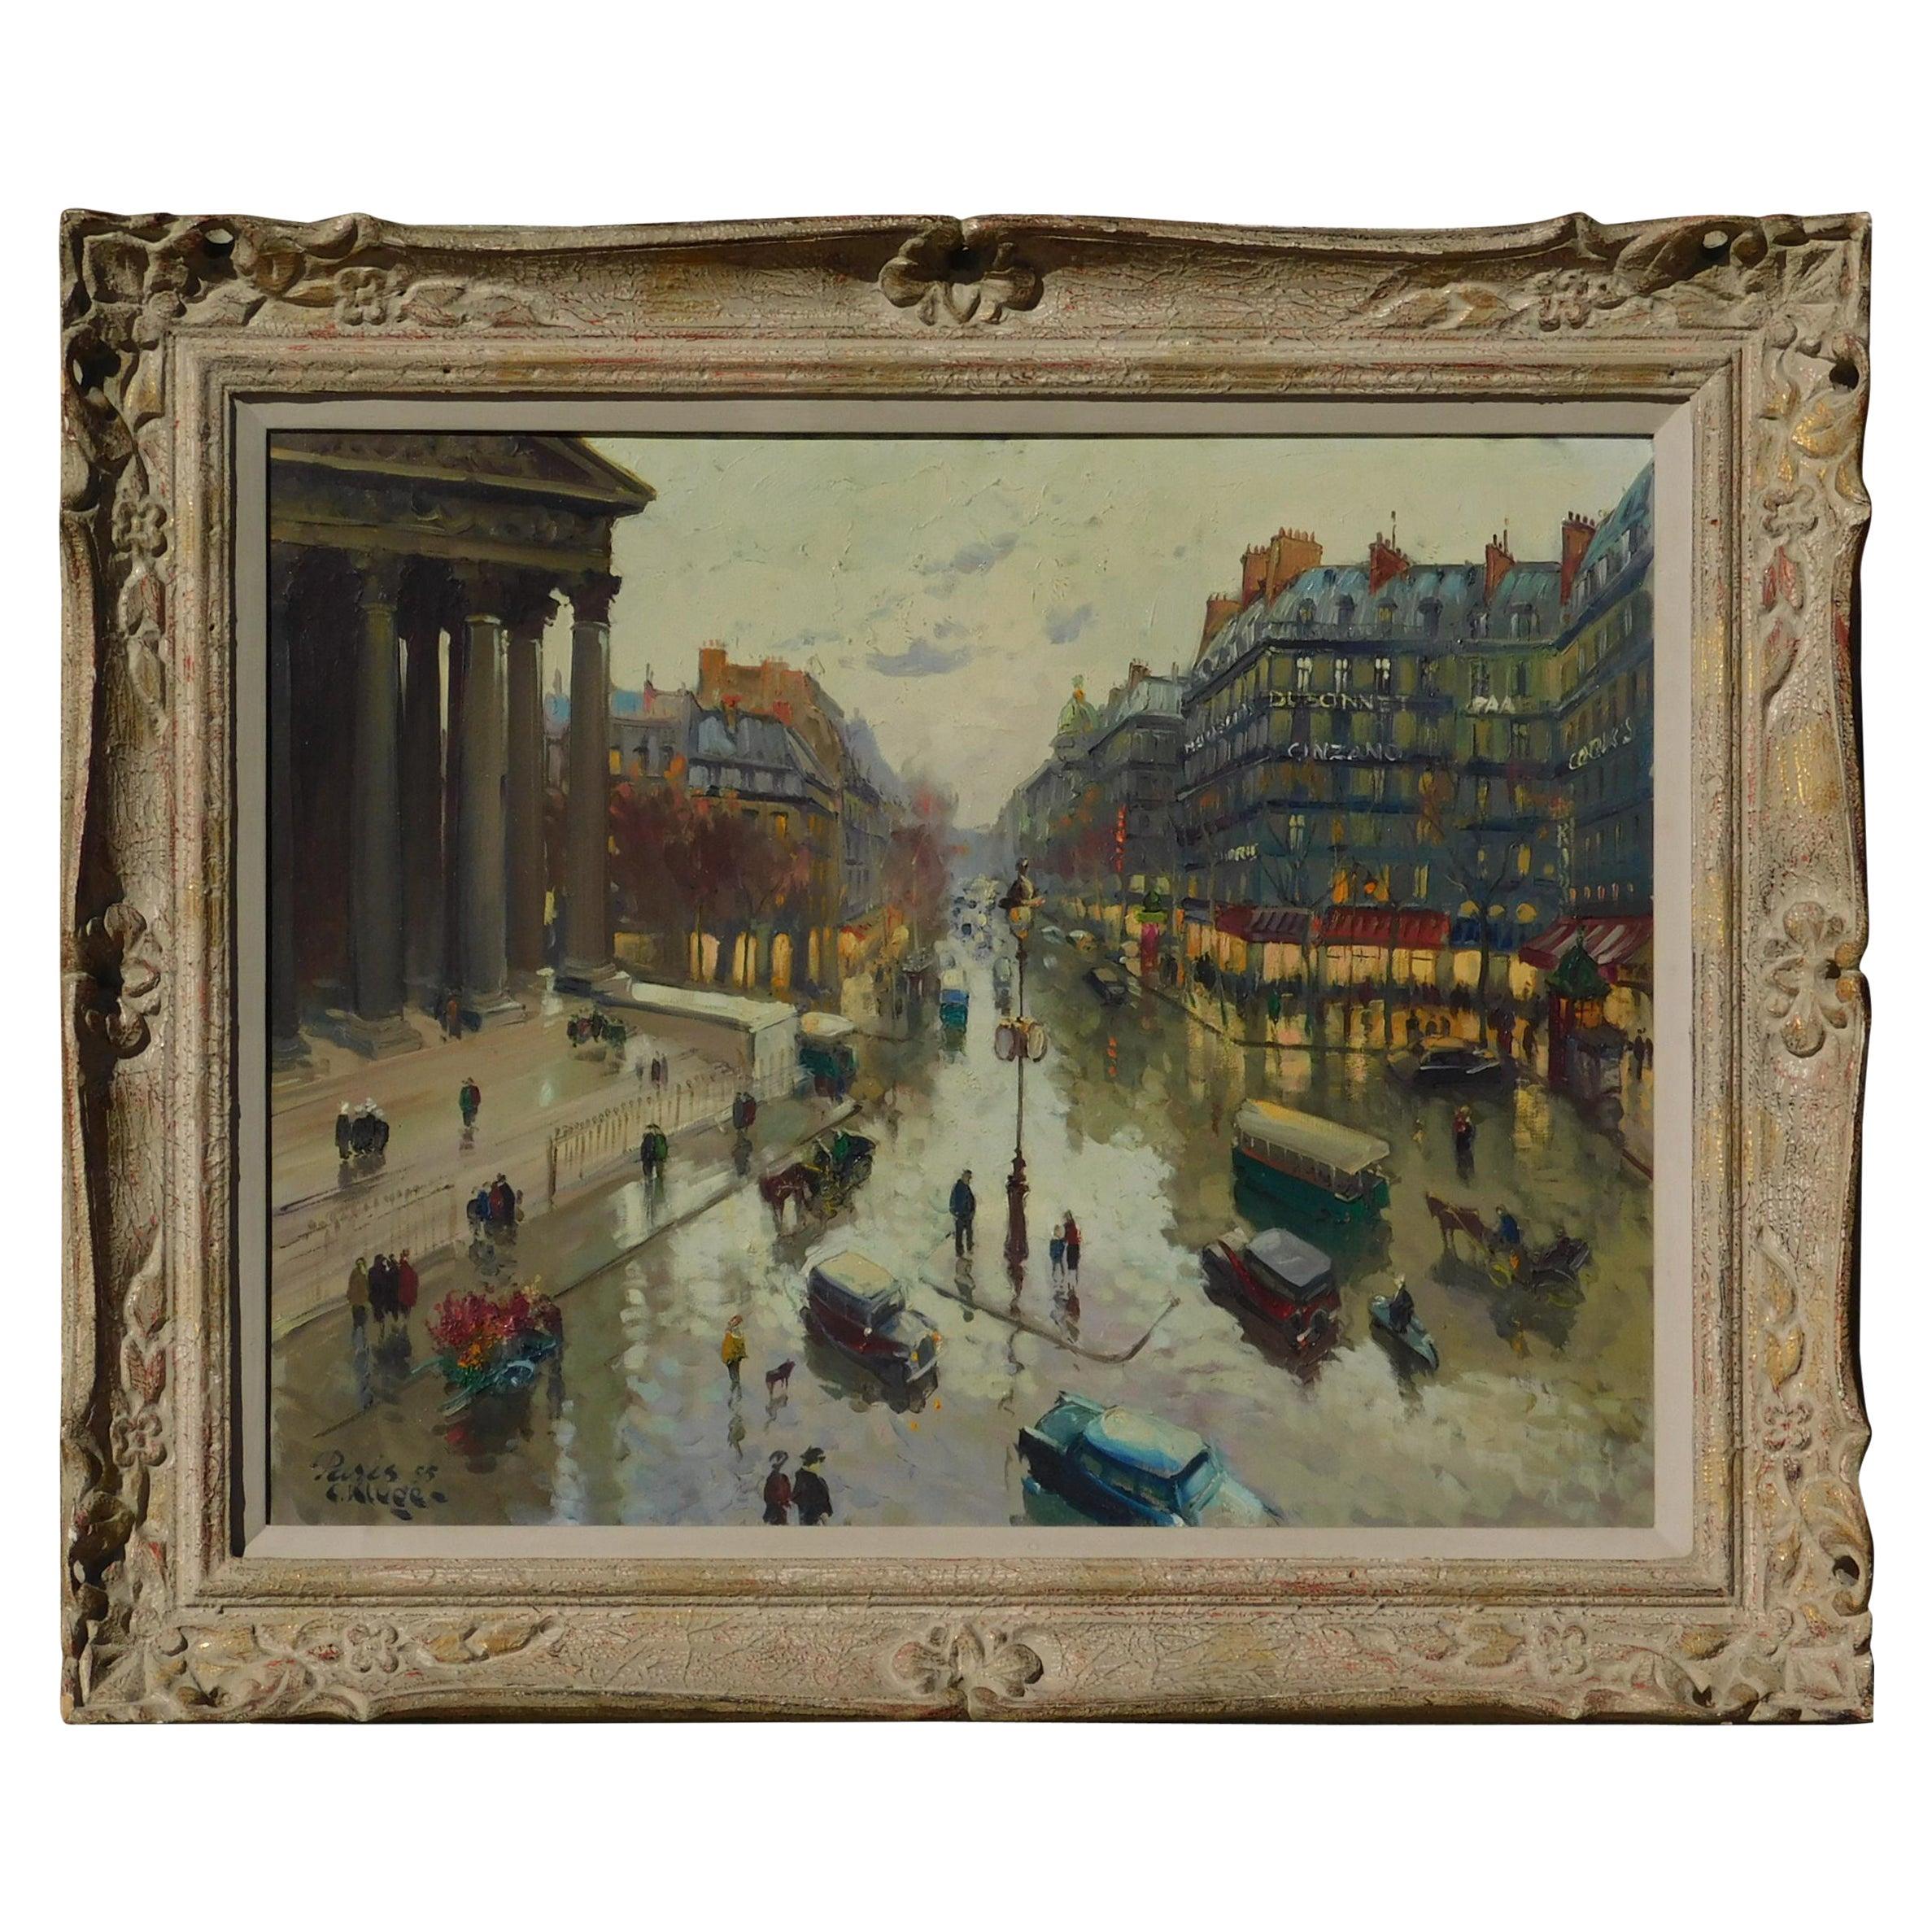 Constantine Kluge Oil on Canvas, Paris City Scene, 1955